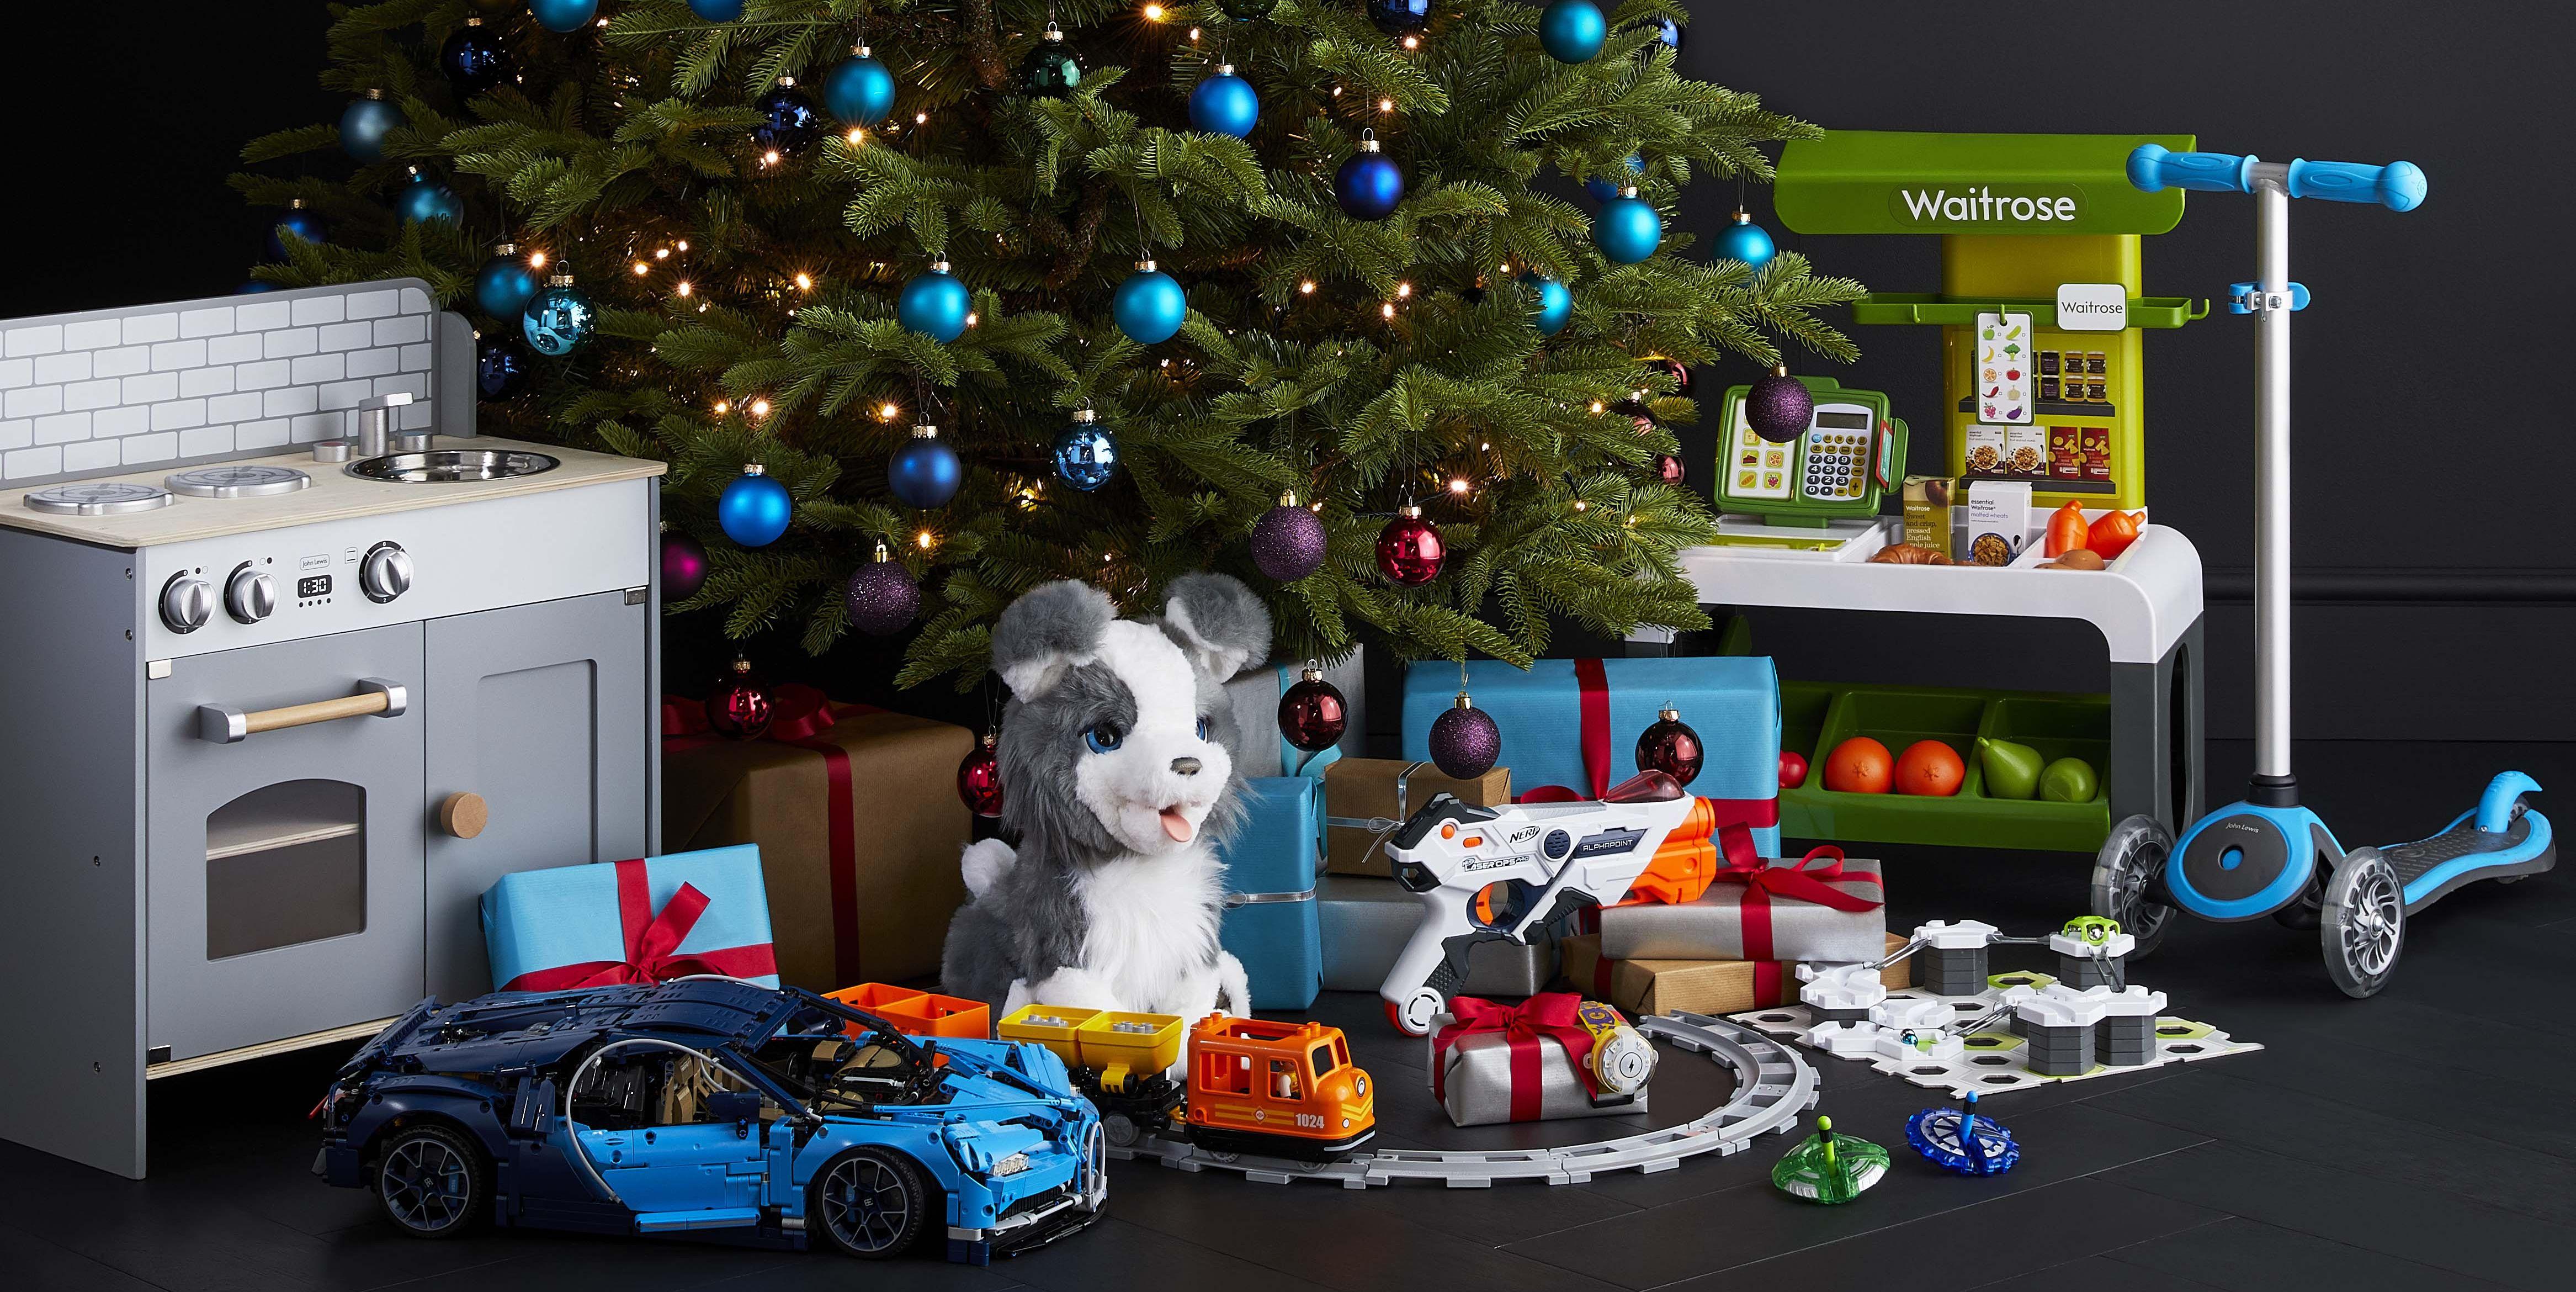 John Lewis's Top Ten Toys for Christmas